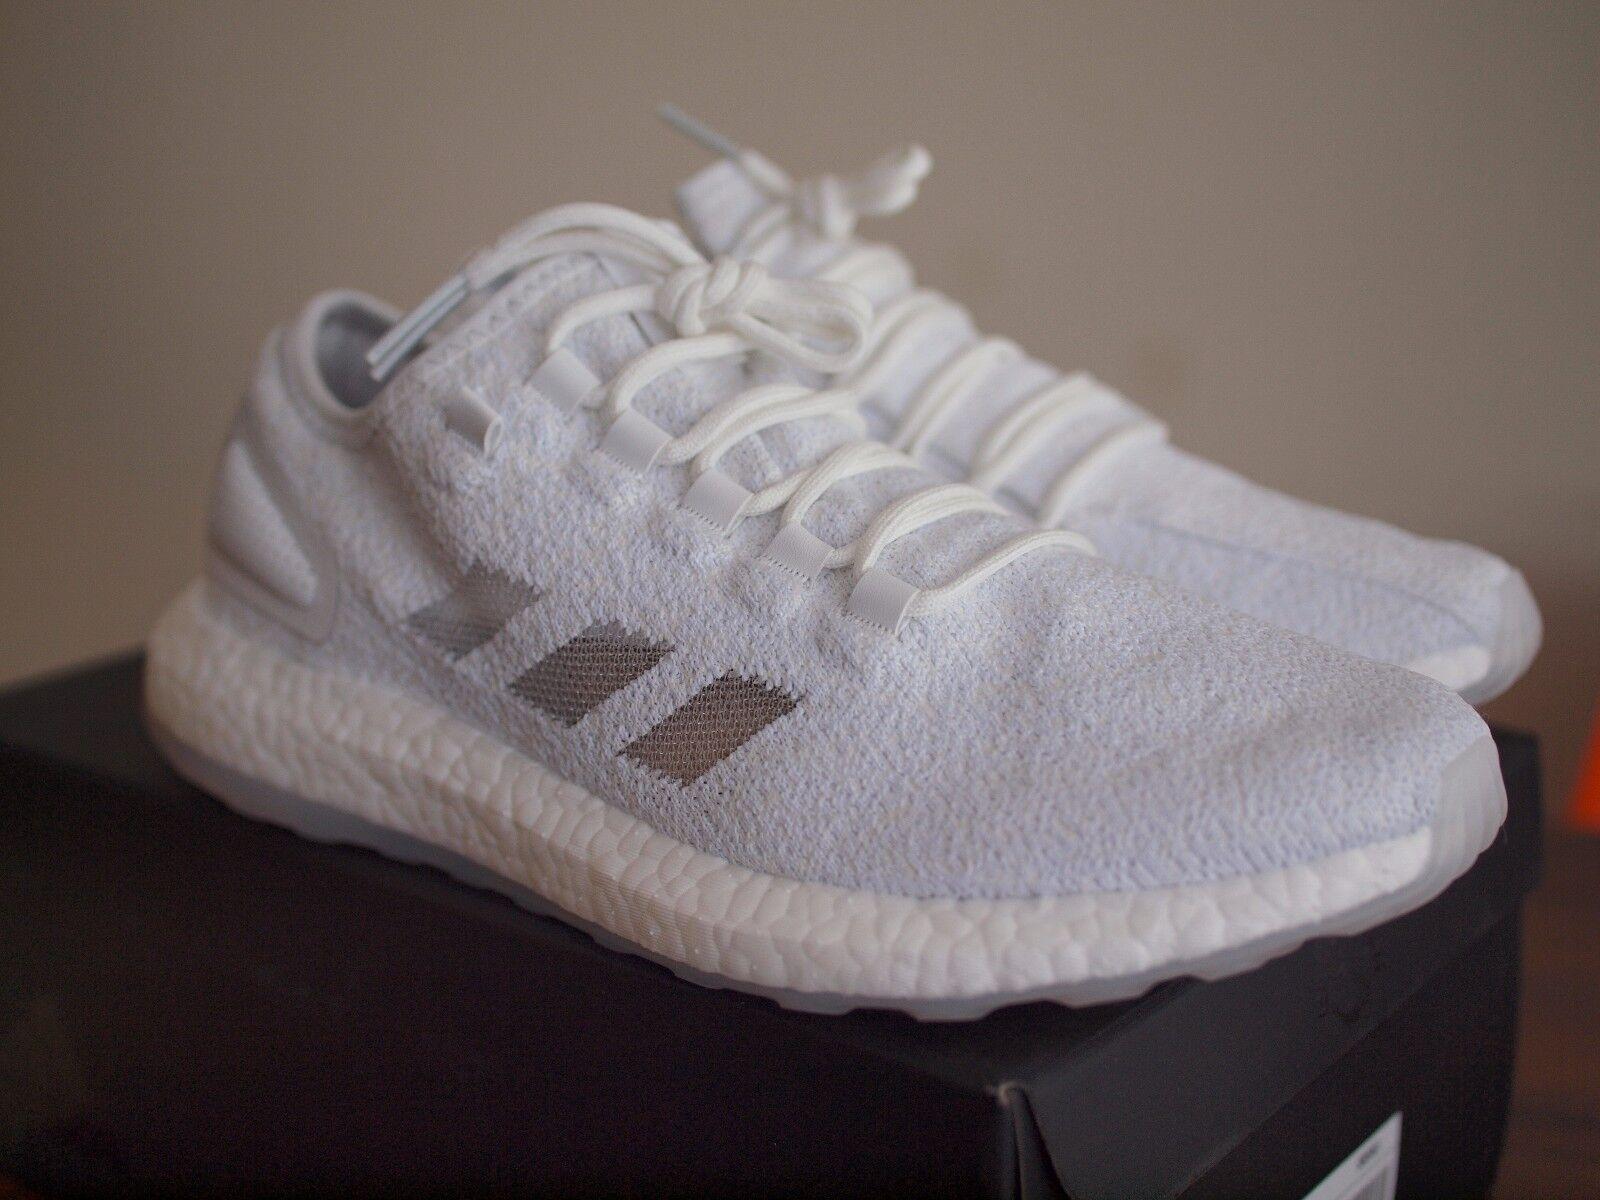 ADIDAS Consortium Pure Boost x sneakerboy X DESIDERIO UK9.5  10 Bianco Primeknit